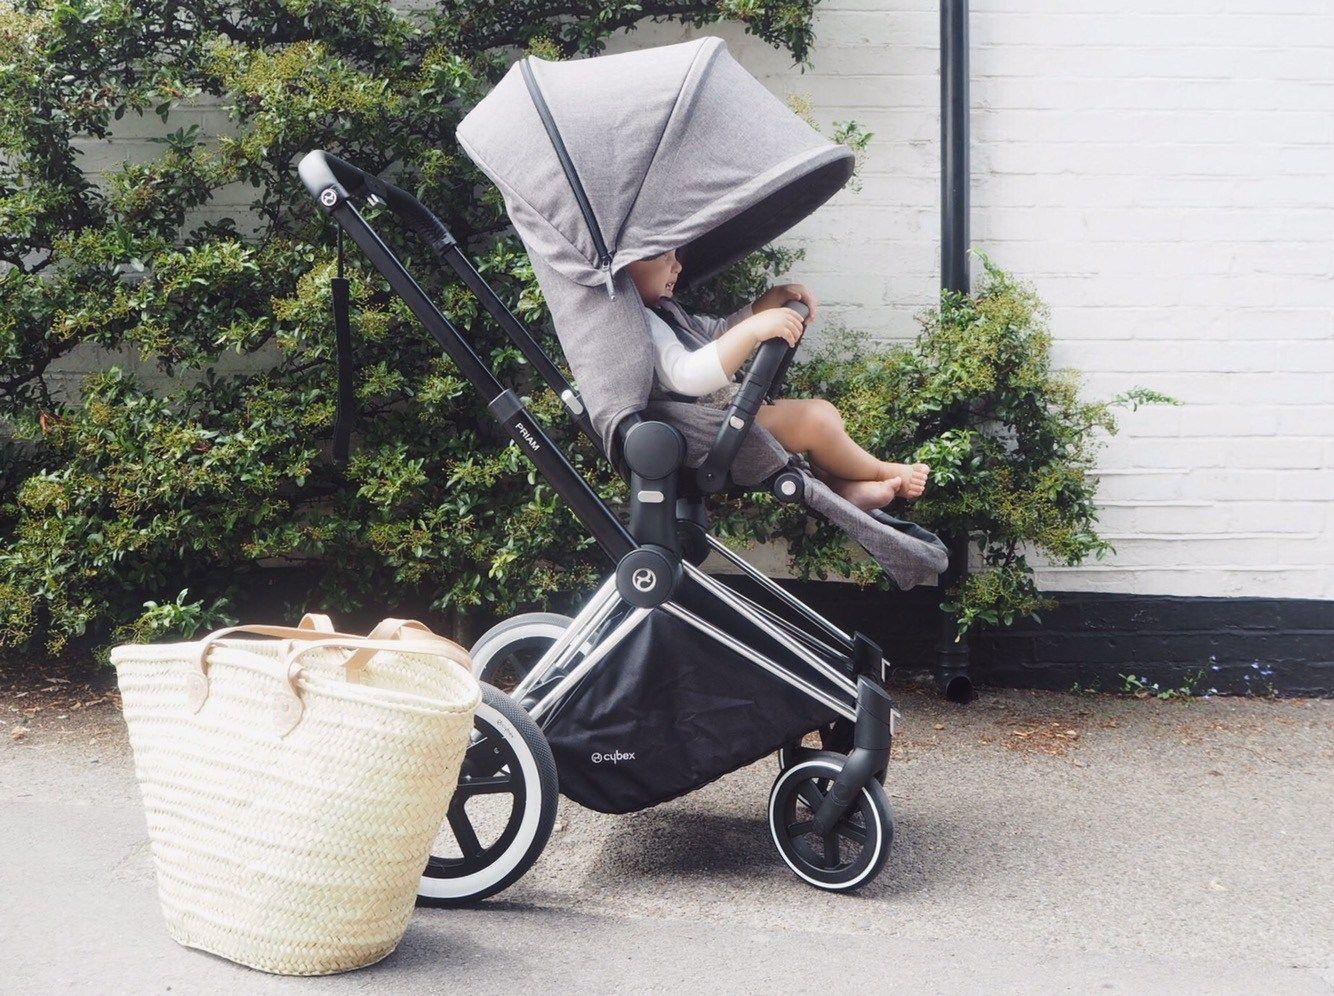 Cybex Priam Stroller (With images) Stroller, Stroller